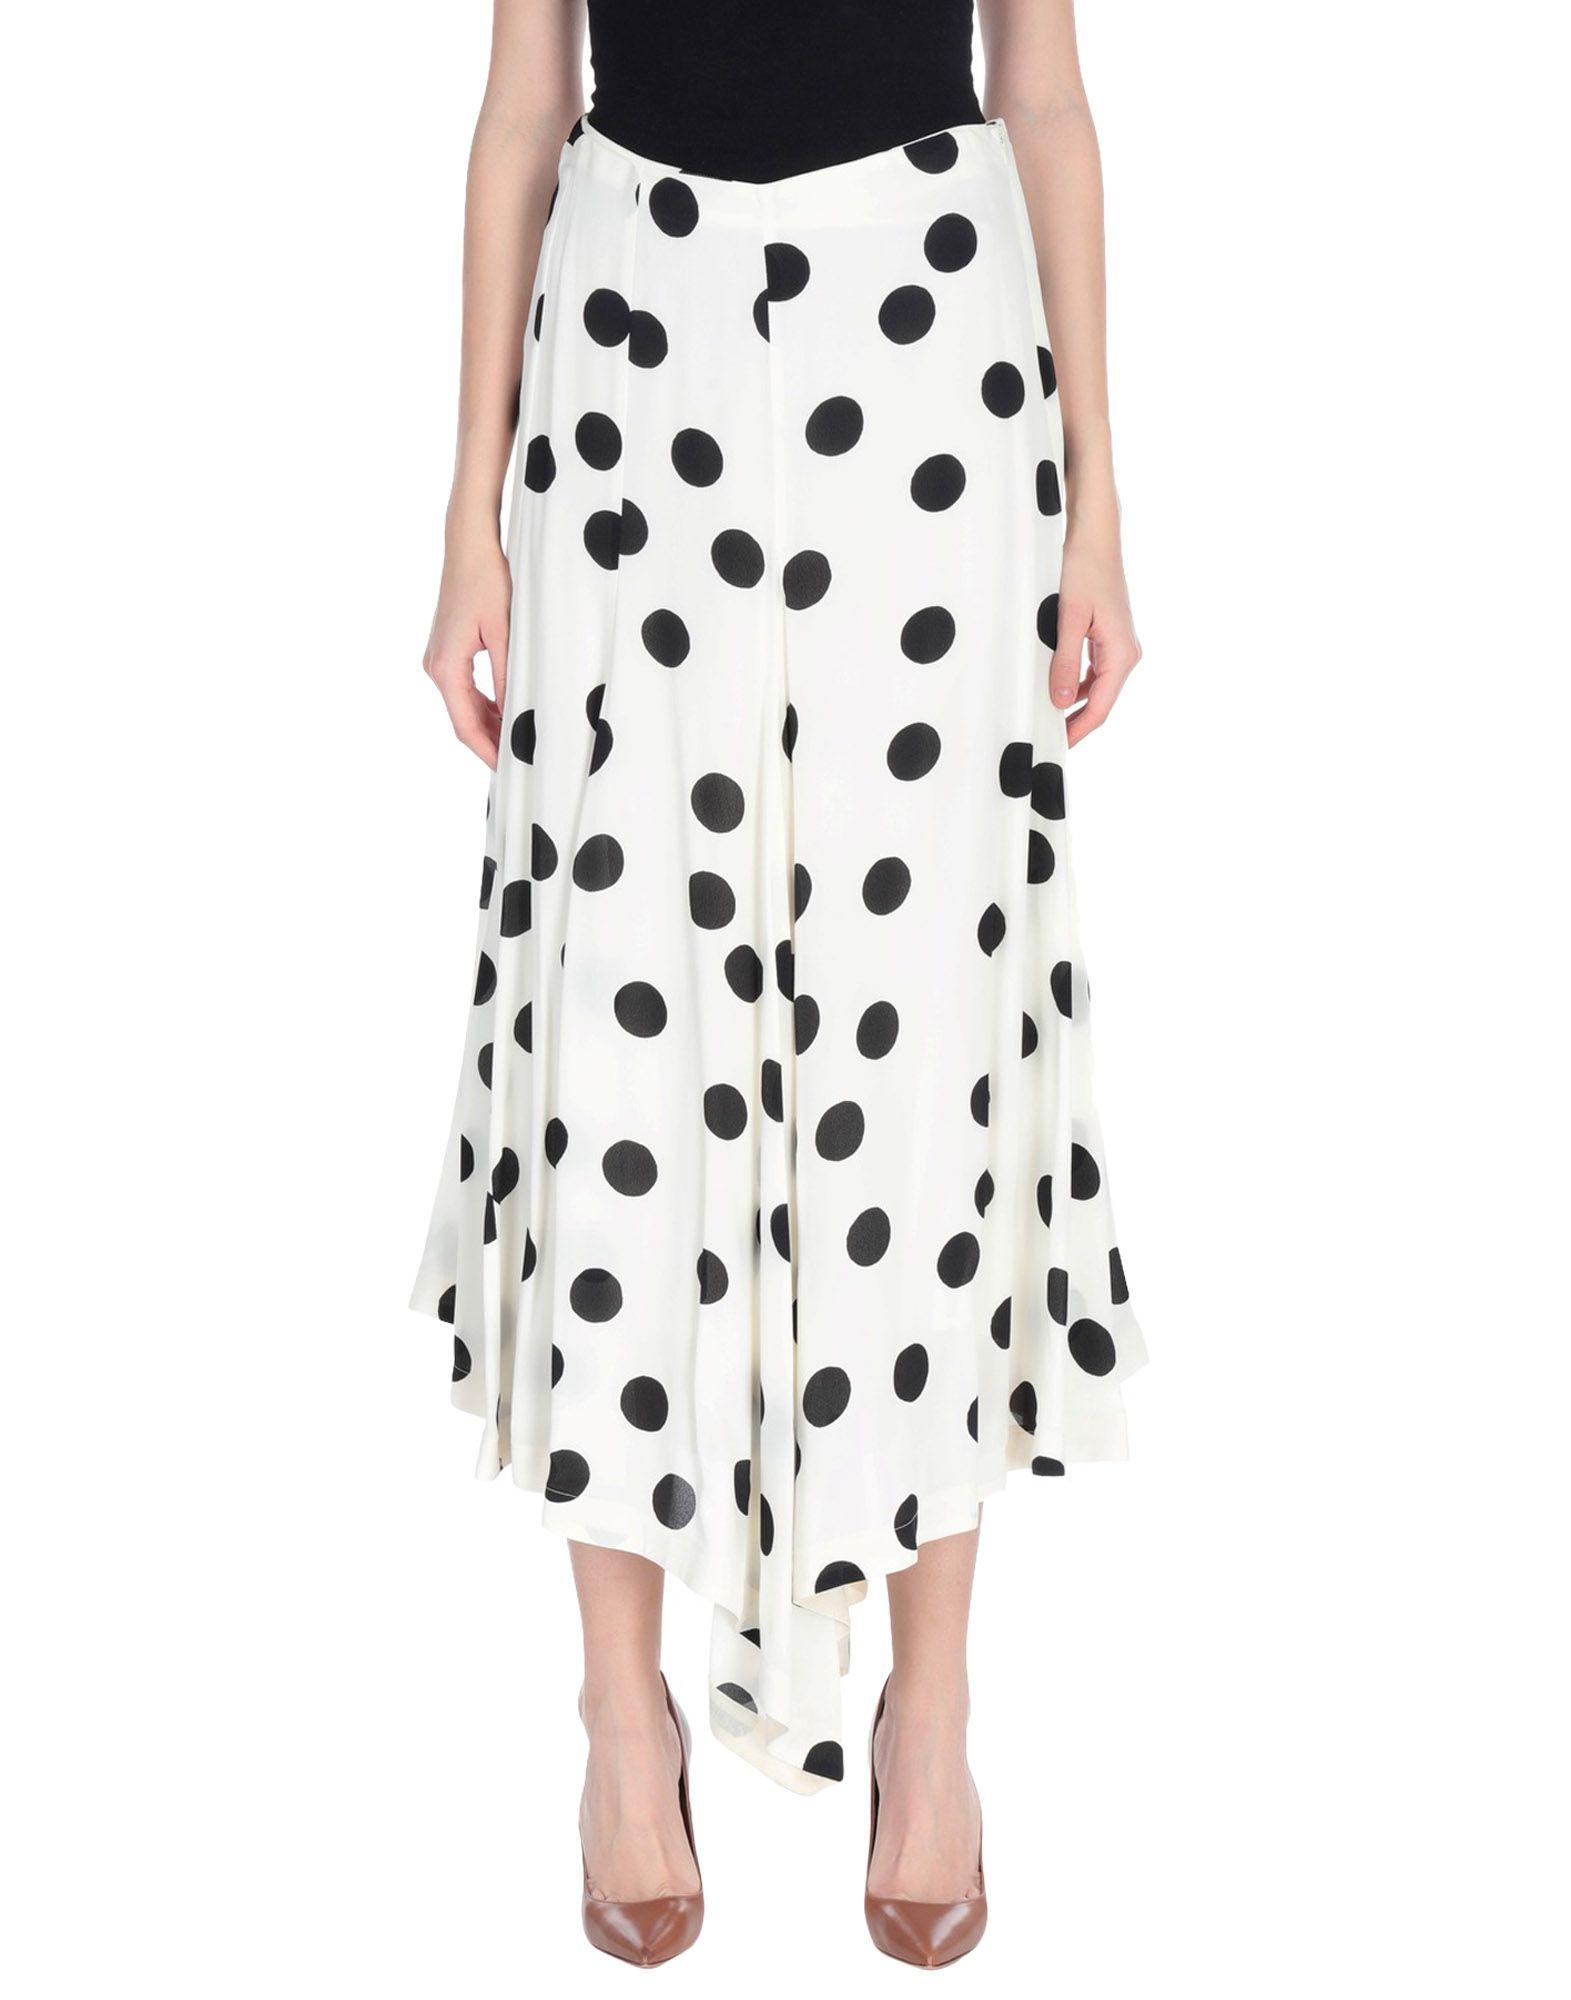 b2f7a742eb Womens skirts maxi| Women's Online Shopping HK | Goxip